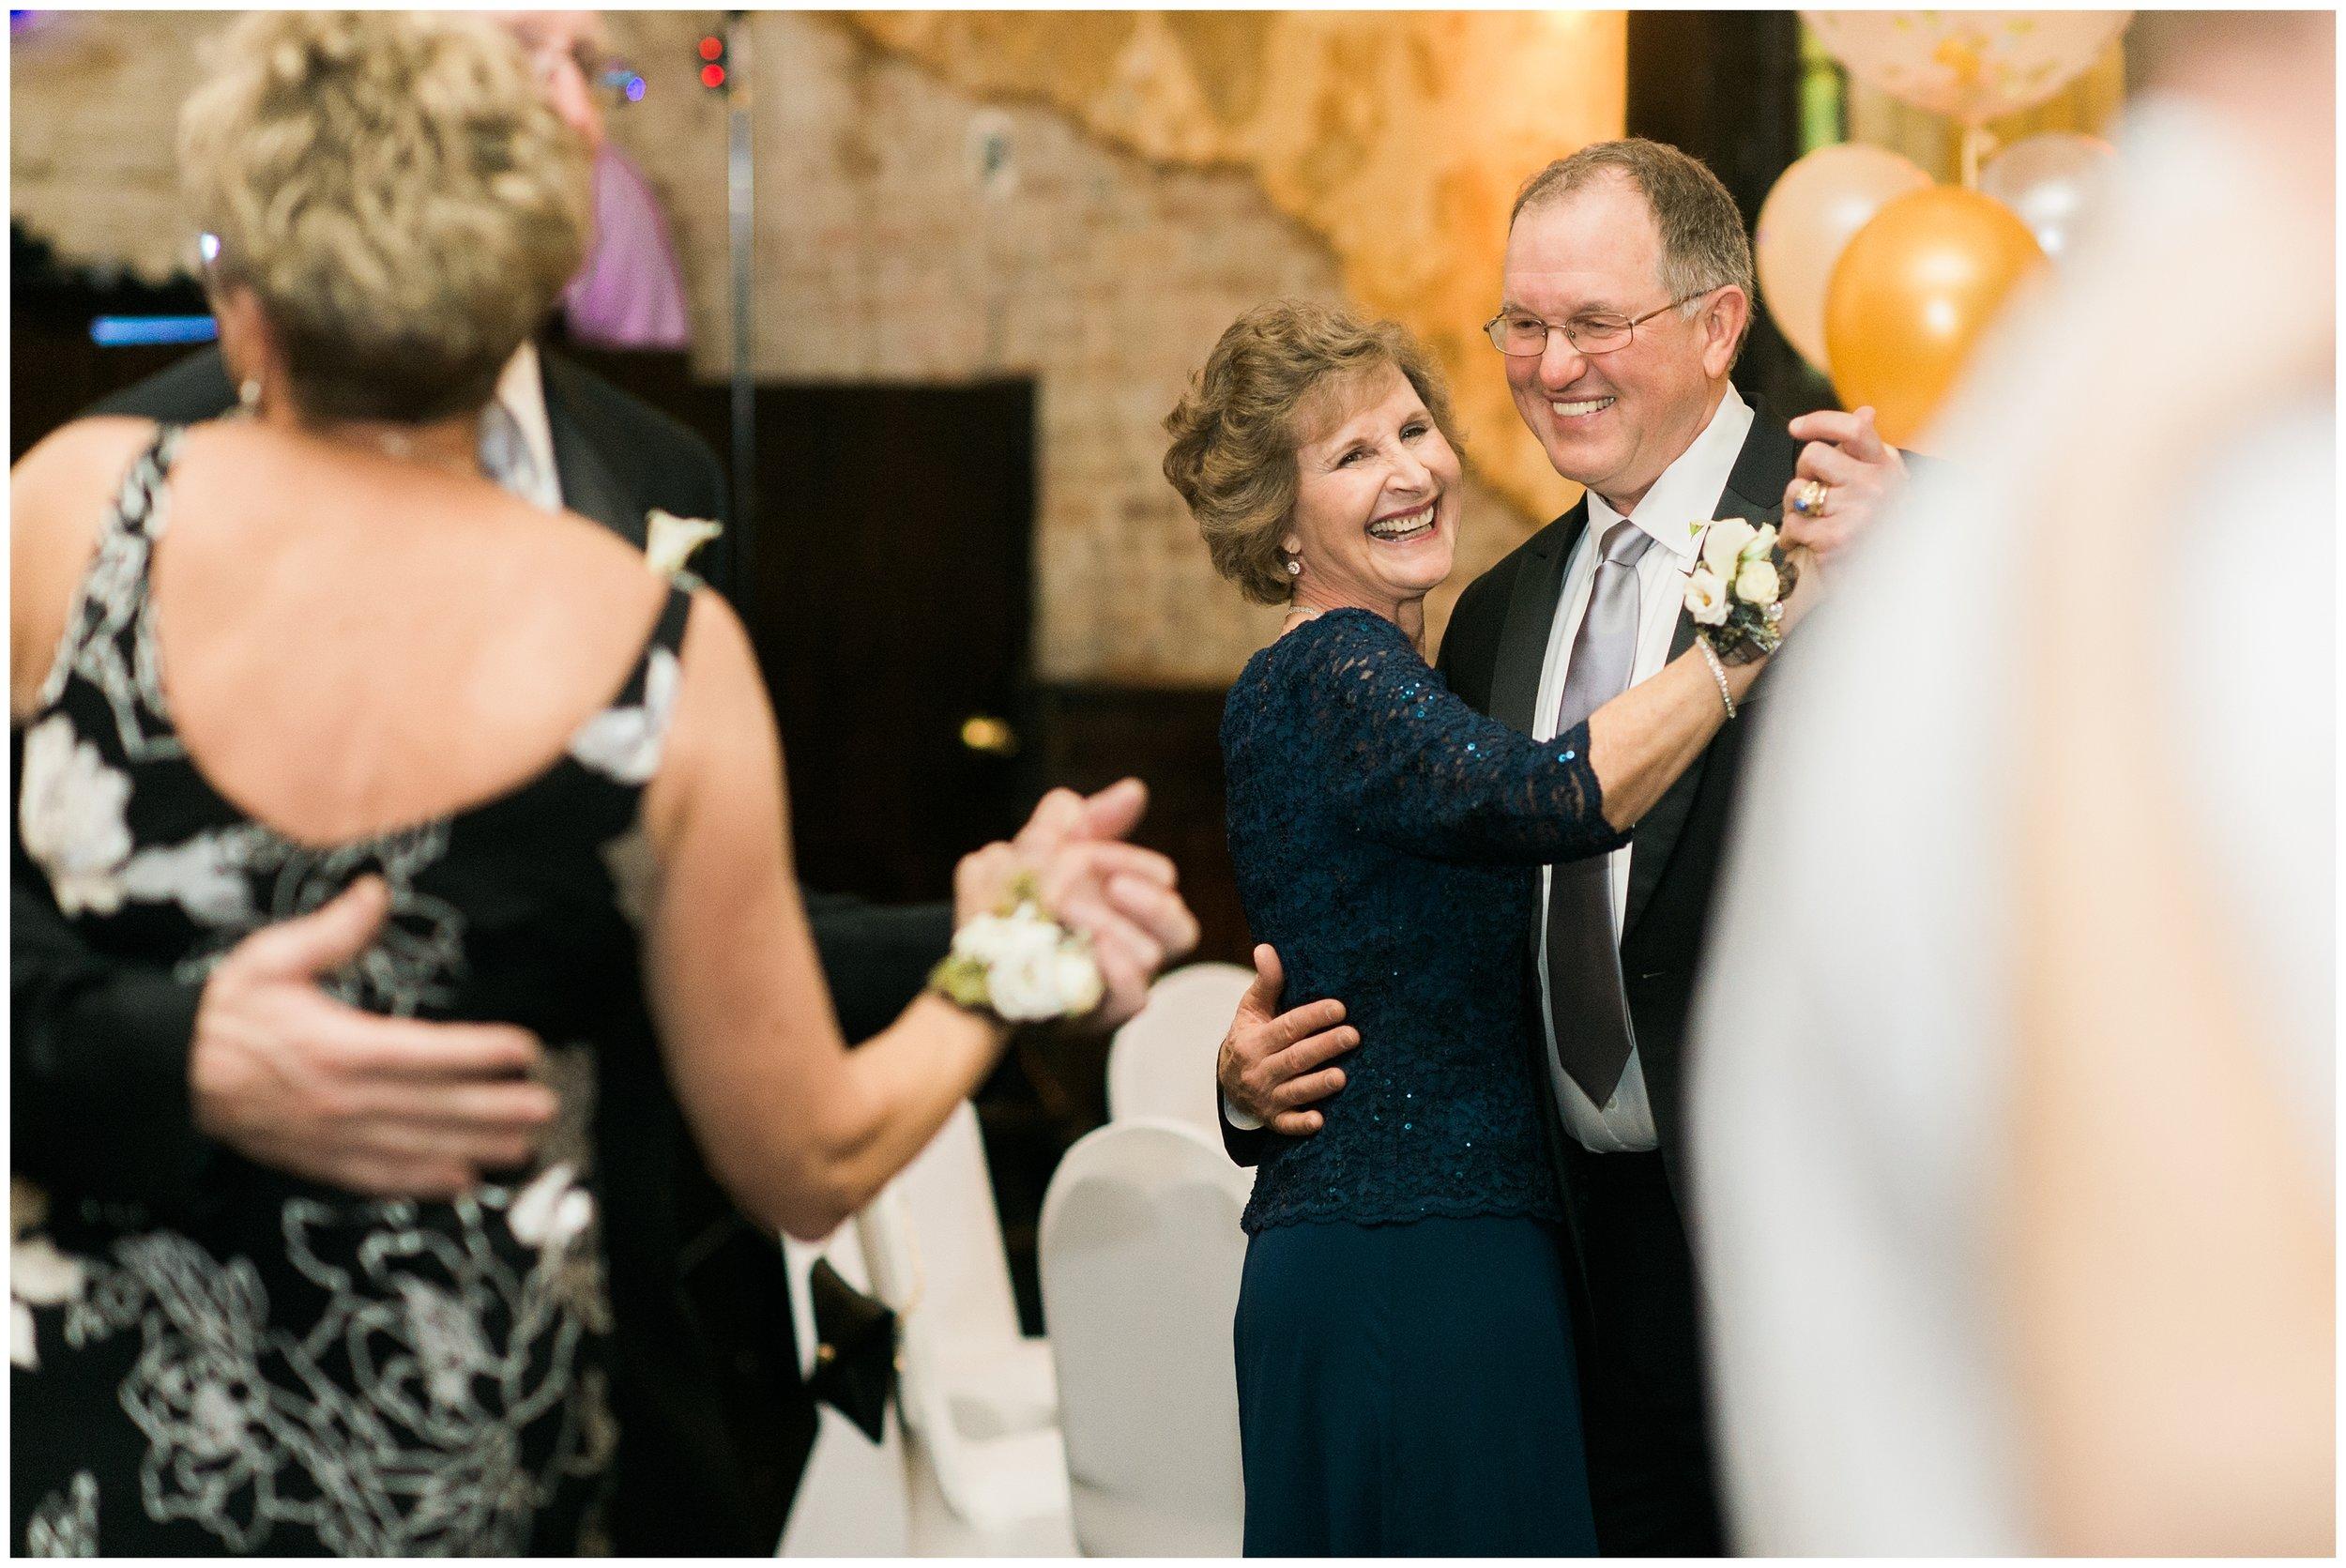 Rebecca_Bridges_Photography_Indianapolis_Wedding_Photographer_5862.jpg